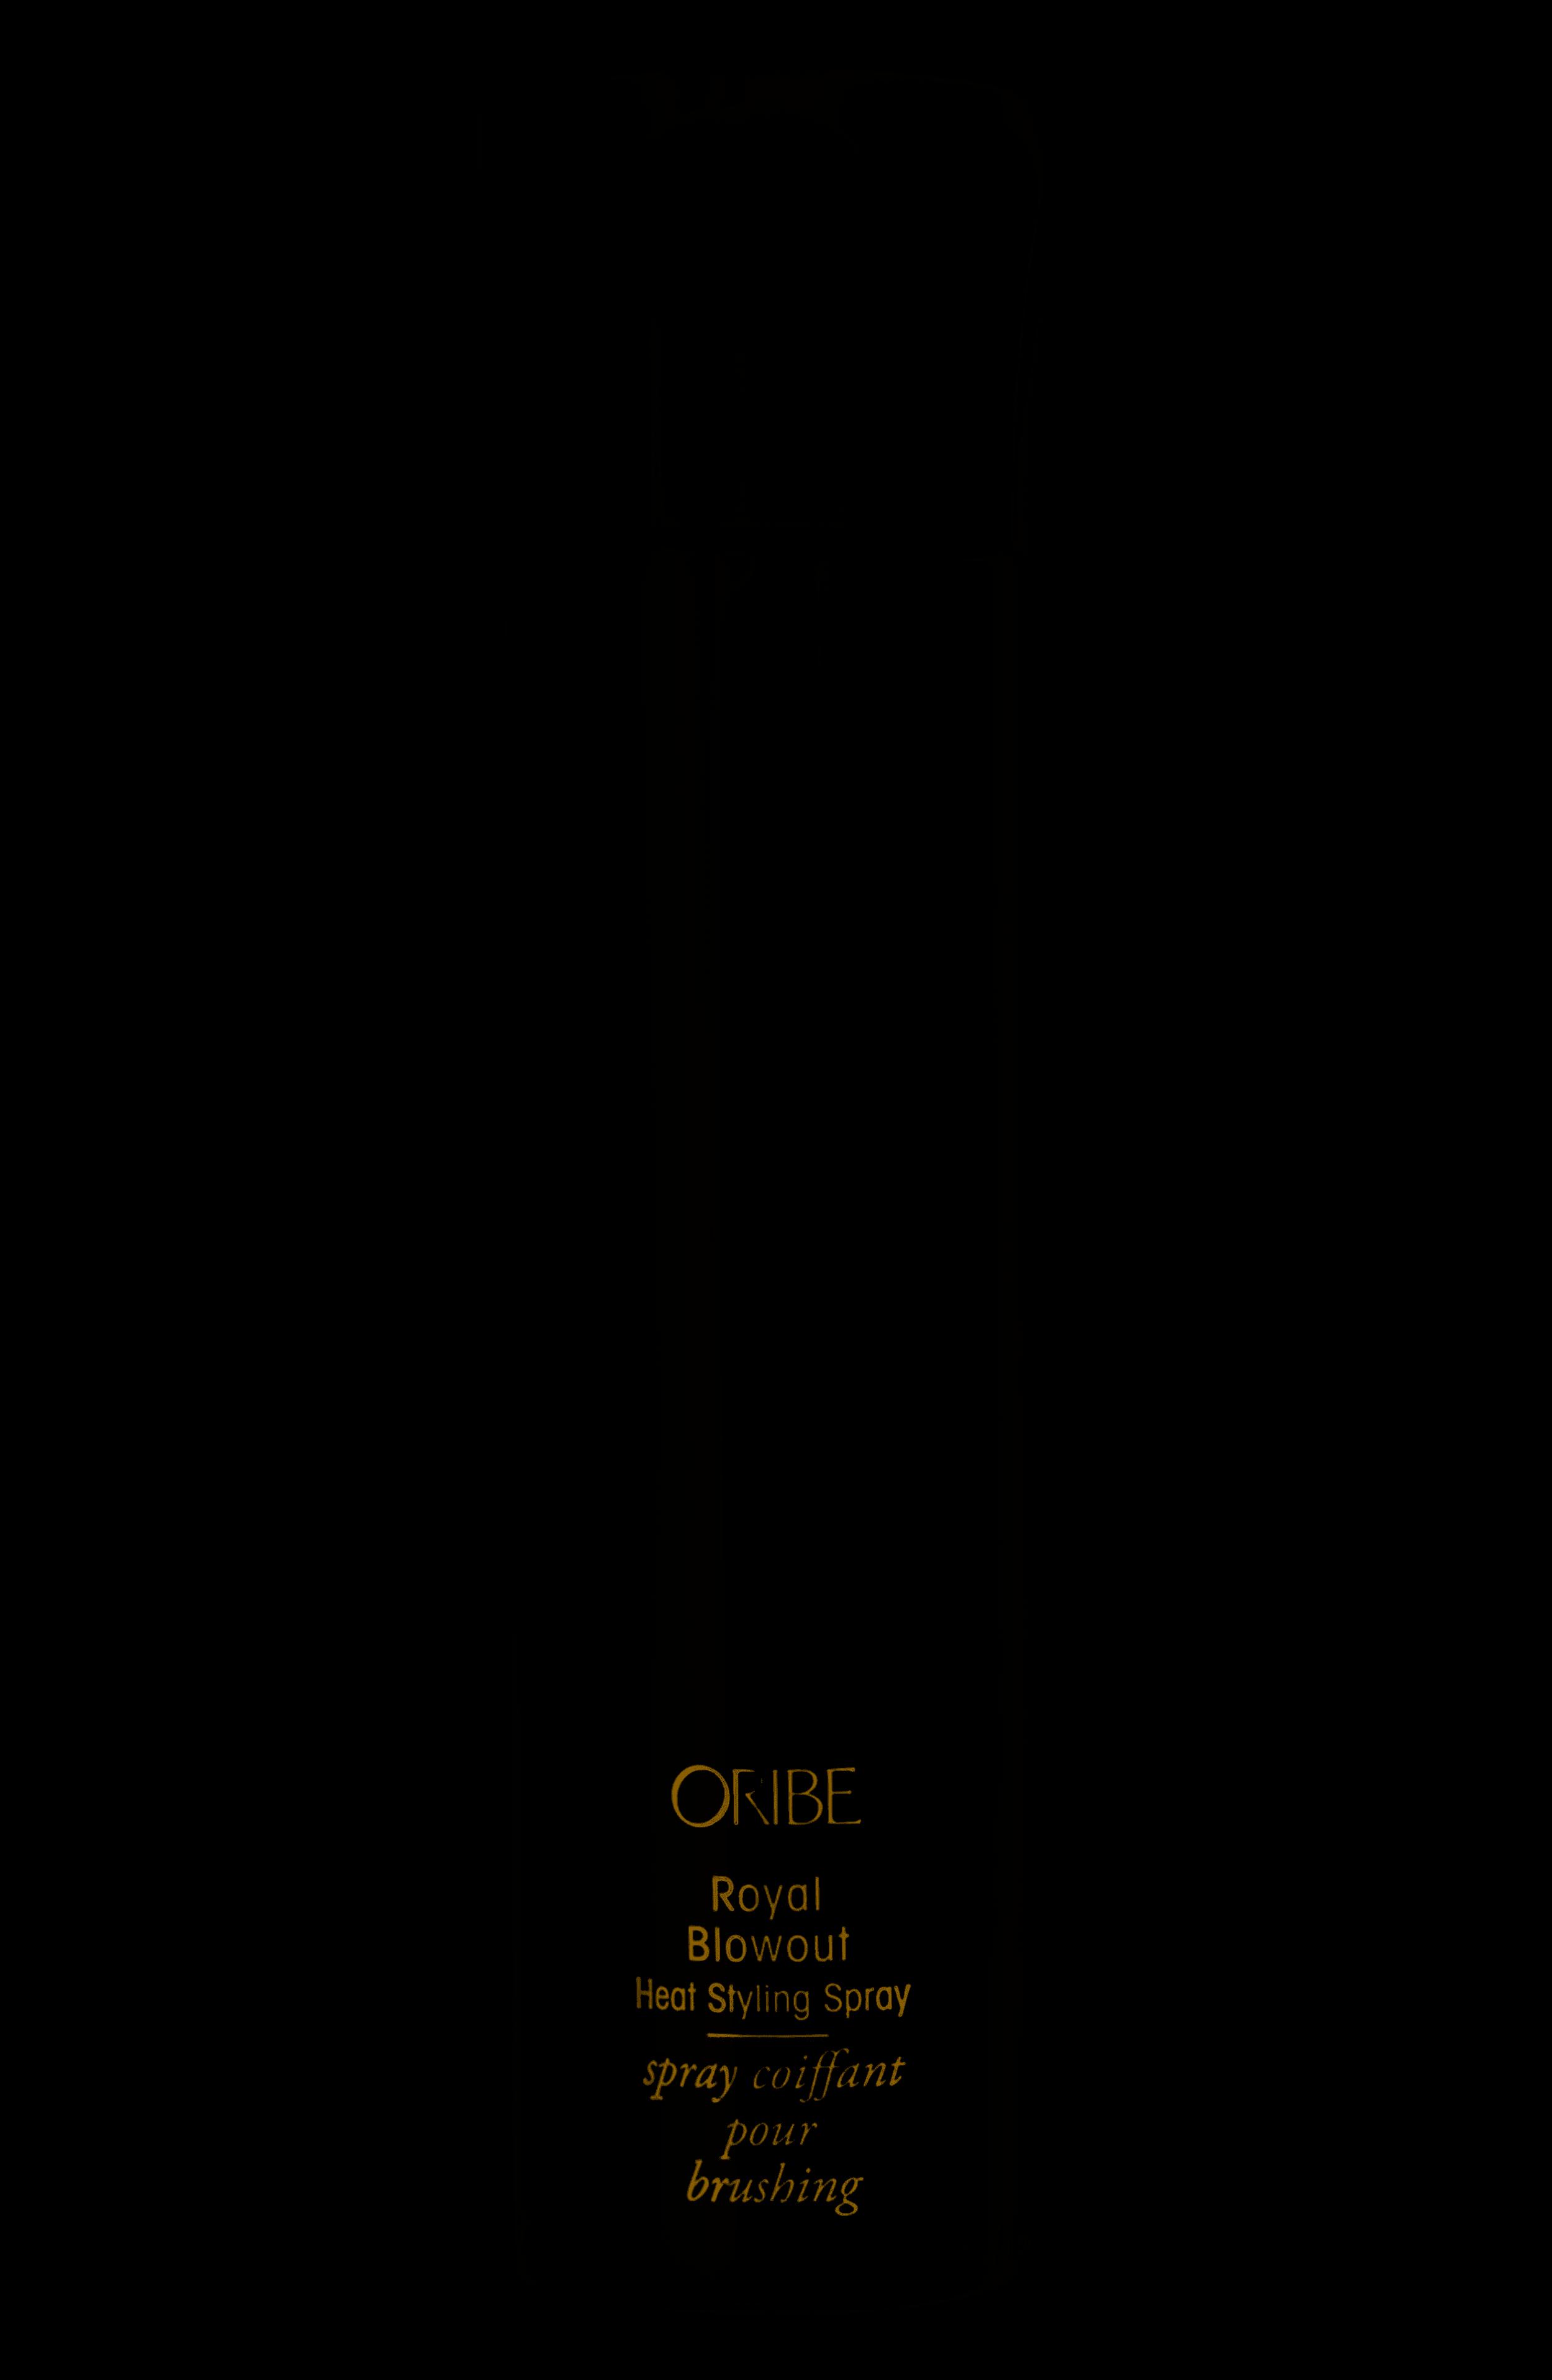 Oribe Royal Blowout -